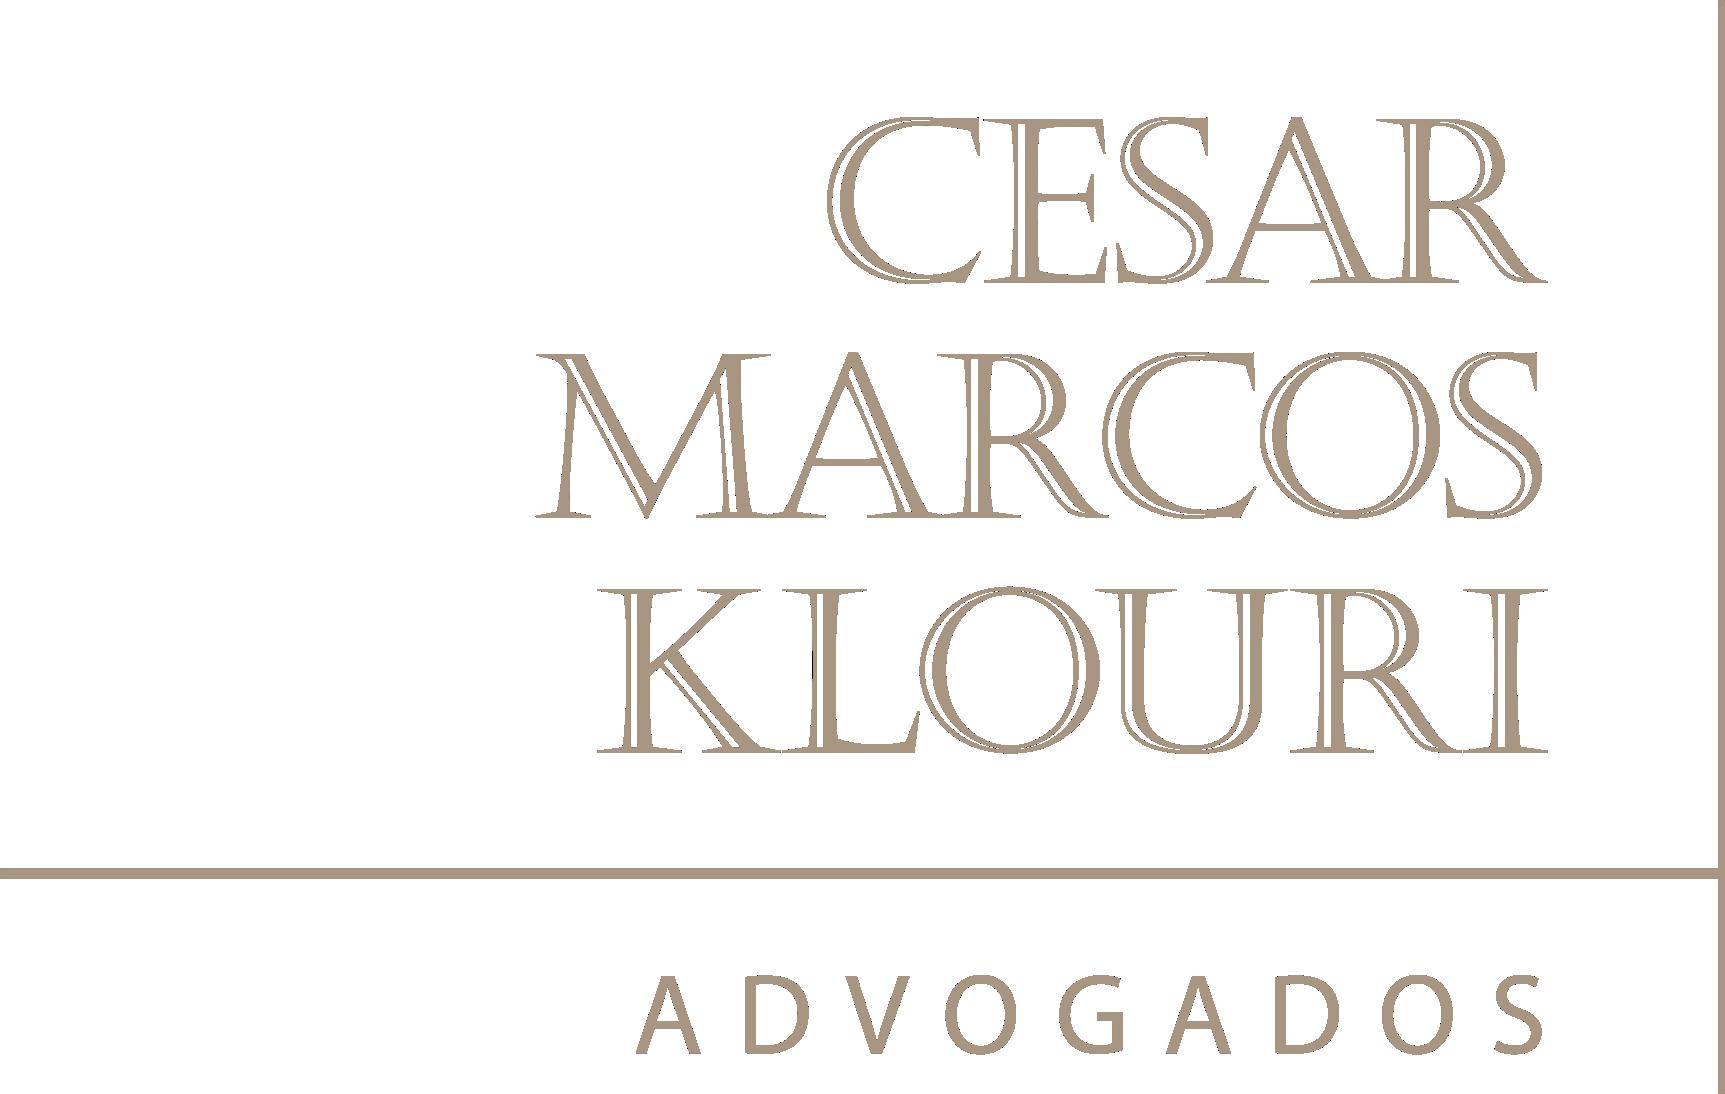 Cesar Klouri Advogados